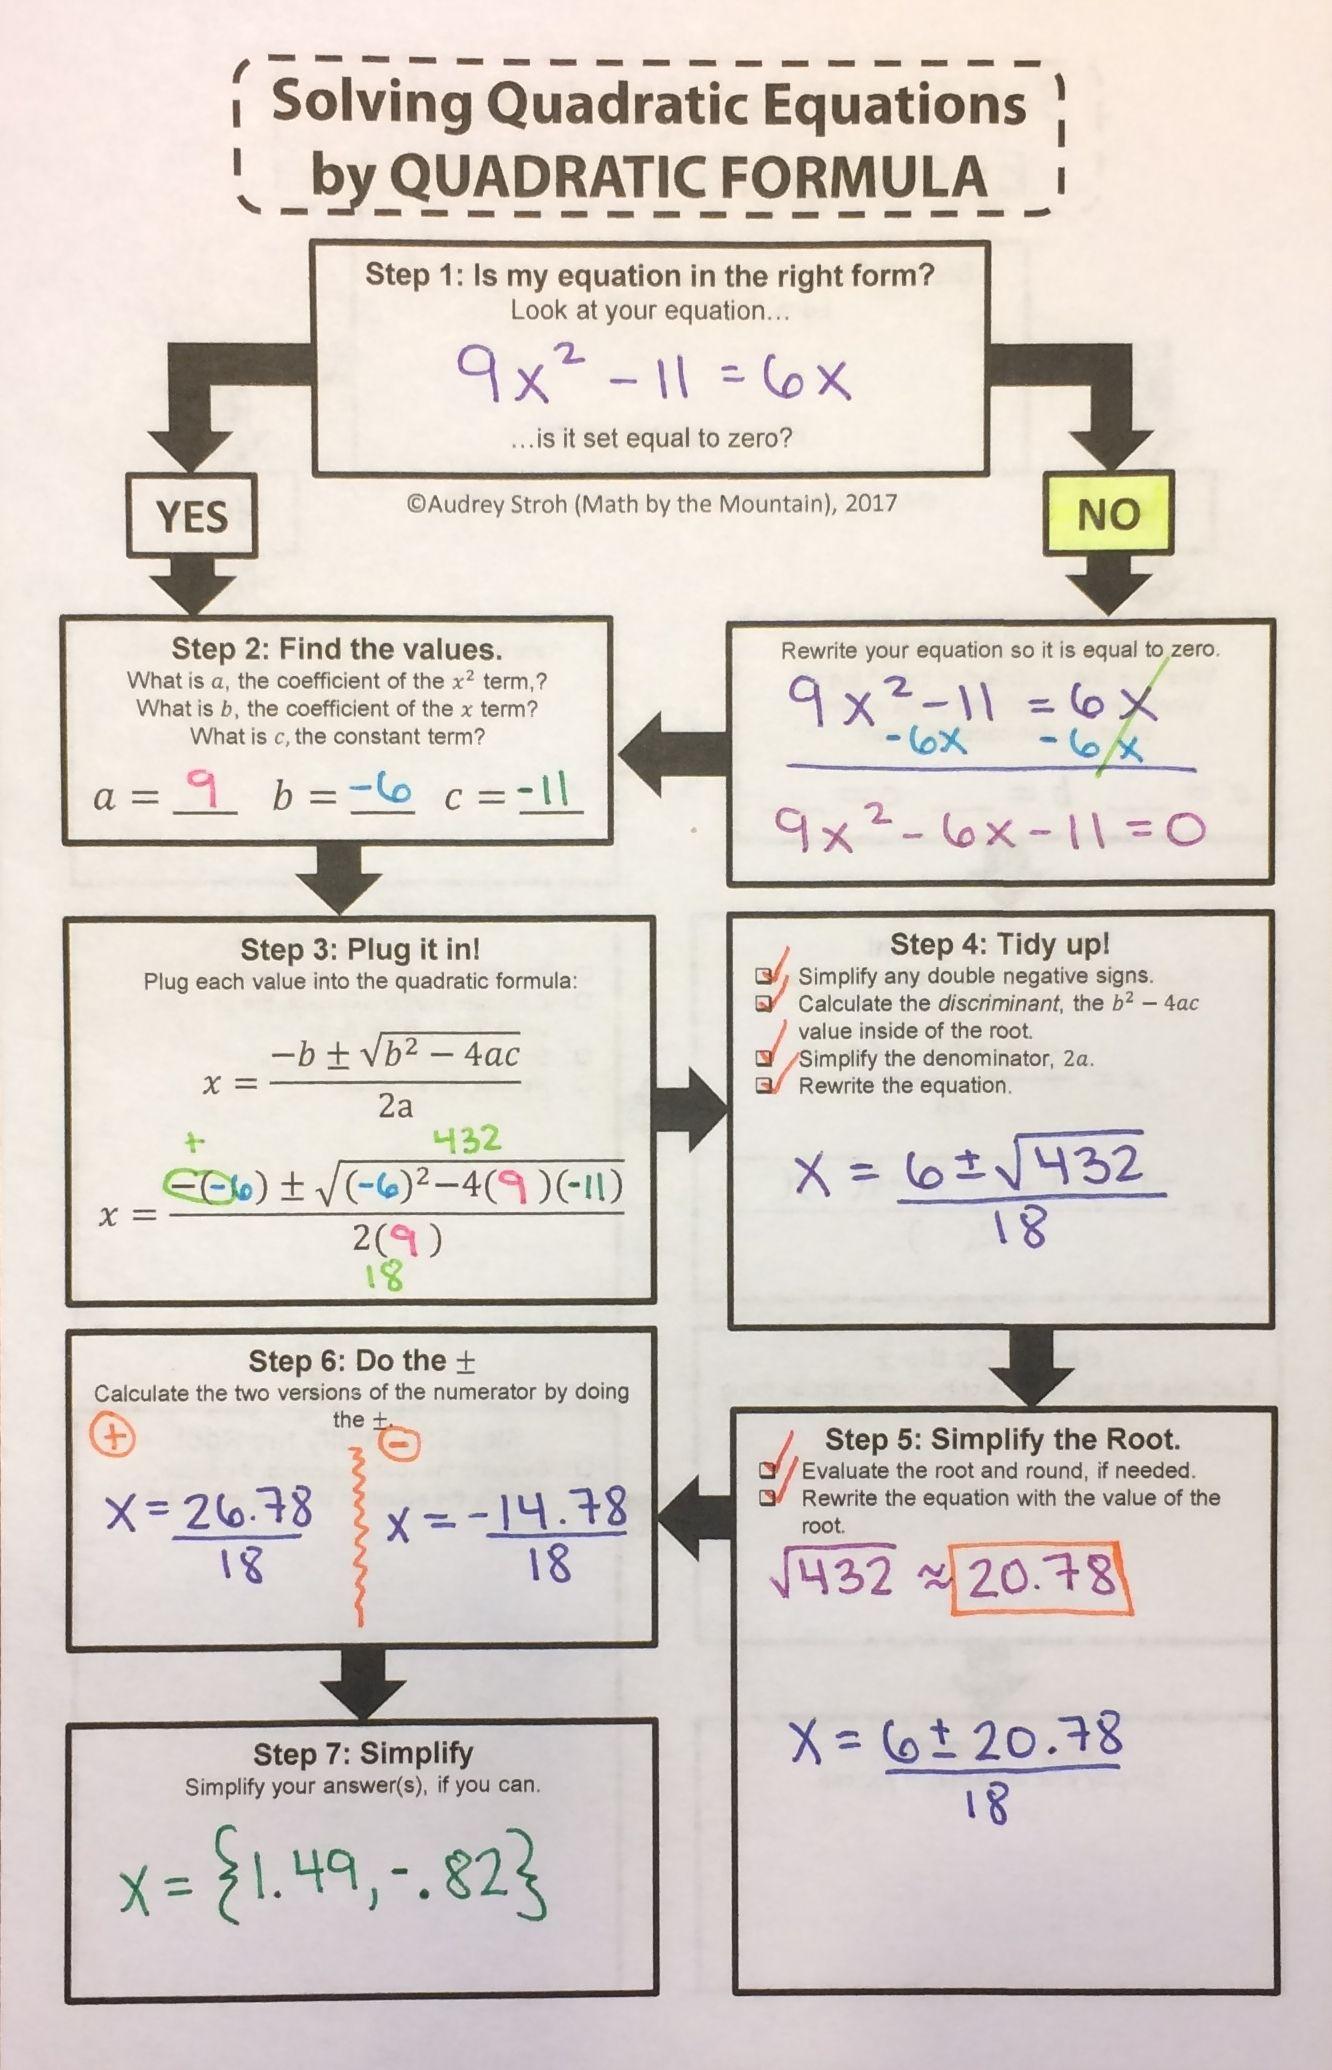 Solving Quadratic Equations By Quadratic Formula Flowchart